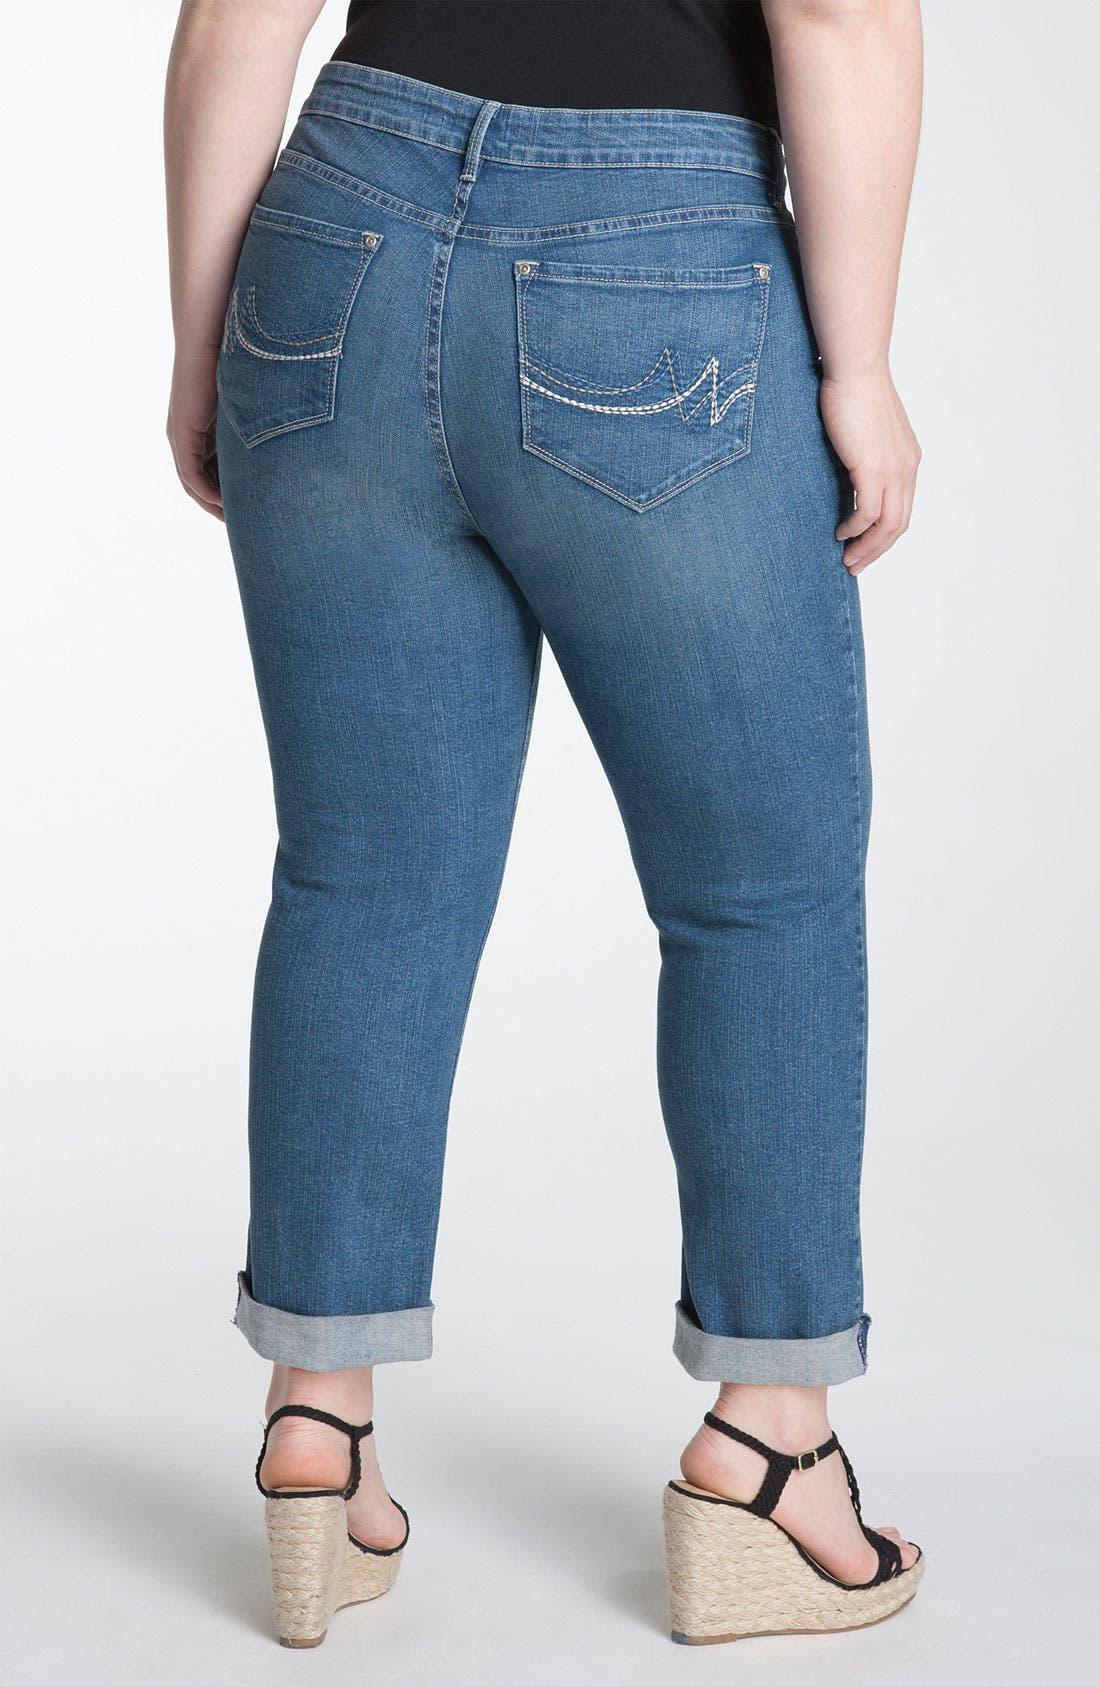 Alternate Image 1 Selected - NYDJ 'Boyfriend' Cuff Crop Jeans (Plus)